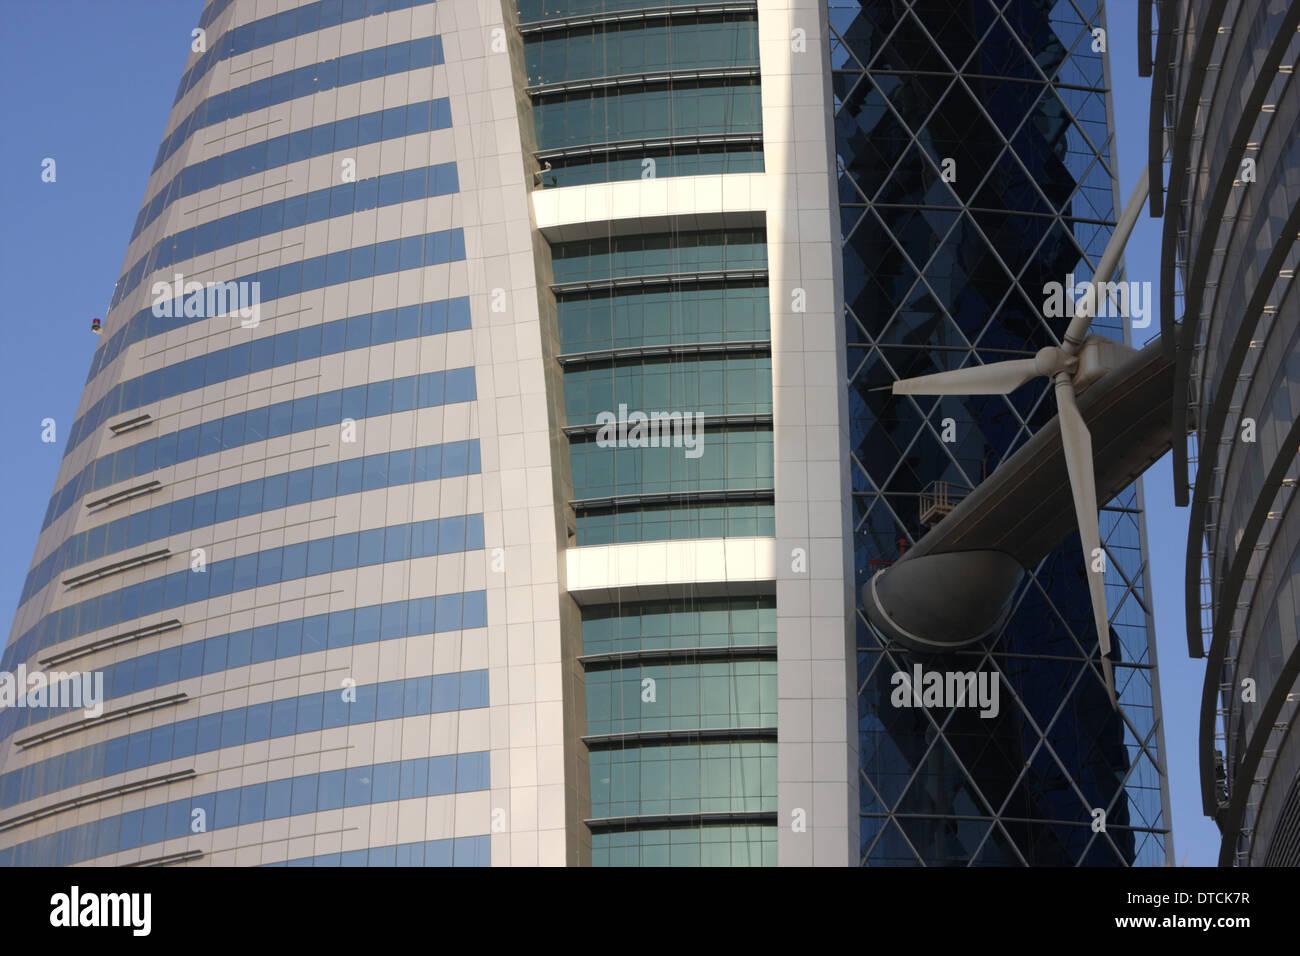 World Trade Centre Building showing turbine, Manama, Kingdom of Bahrain - Stock Image